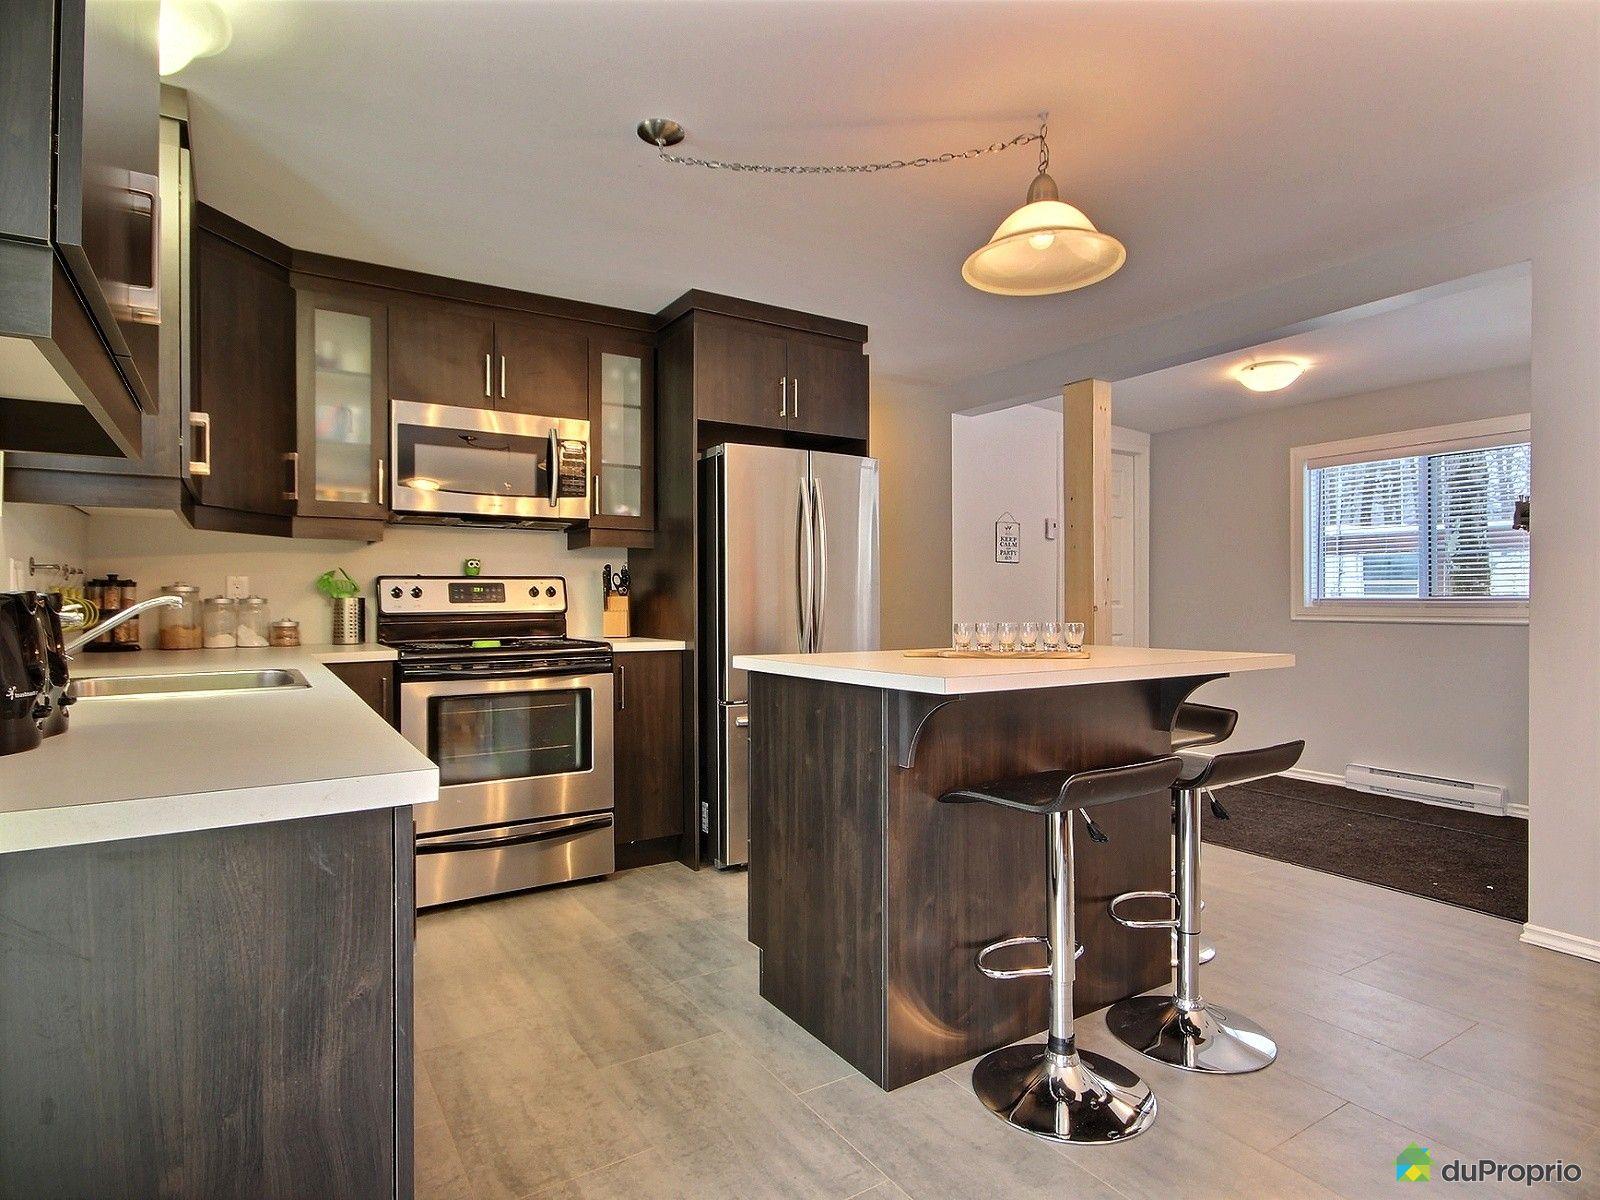 maison vendu beaupr immobilier qu bec duproprio 687397. Black Bedroom Furniture Sets. Home Design Ideas